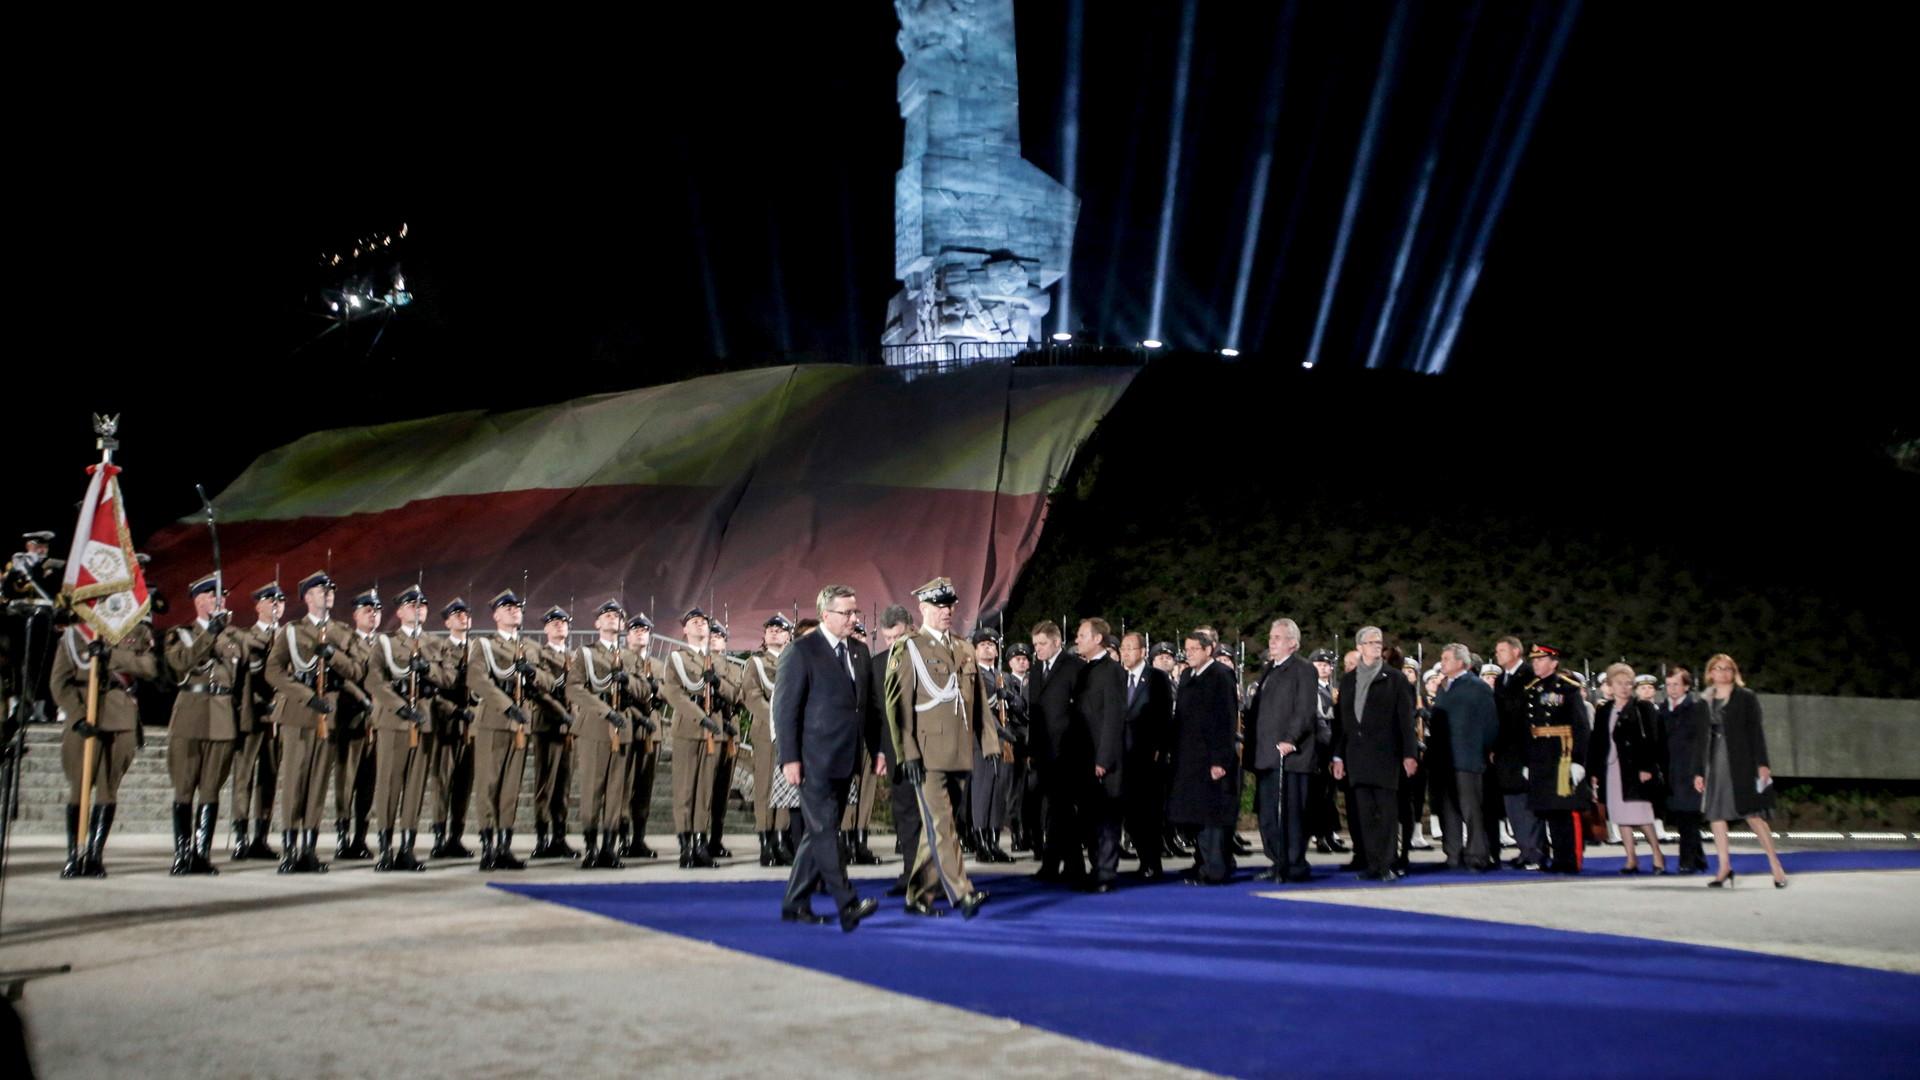 Bronislaw Komorowski à la cérémonie commémorative à Gdansk